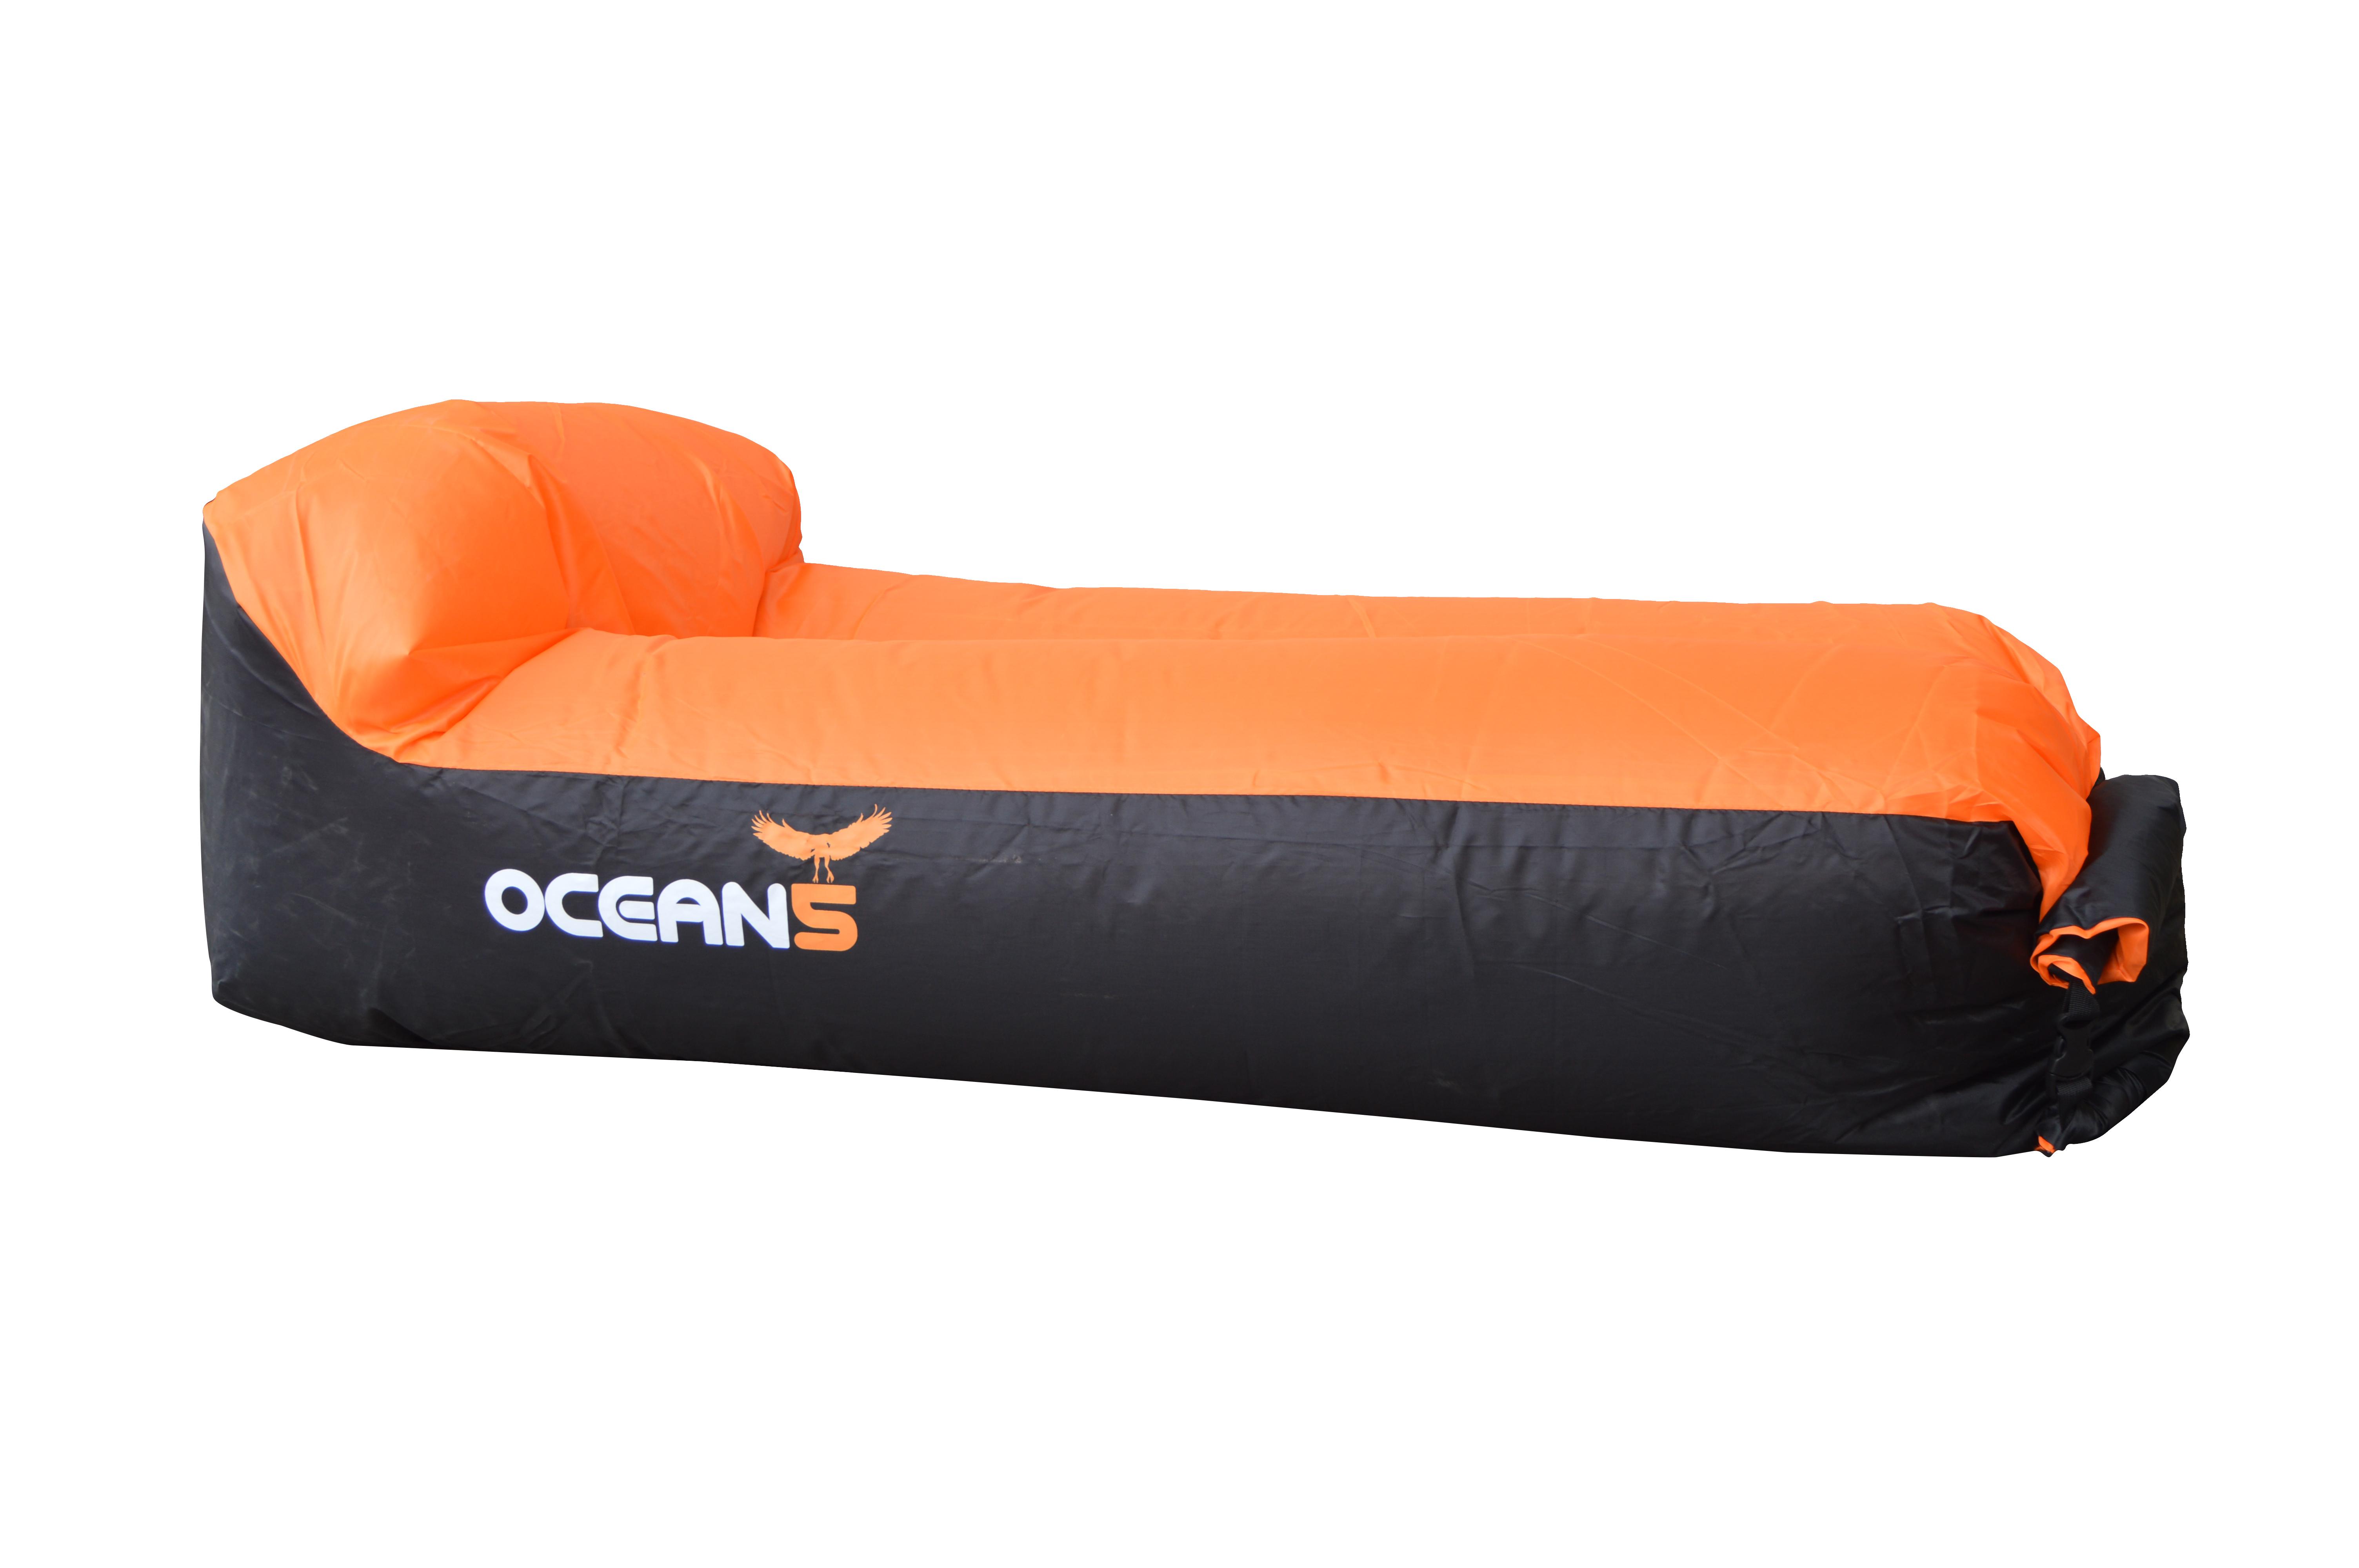 Ocean5 Luftsofa / Air Lounger - Orange/Schwarz